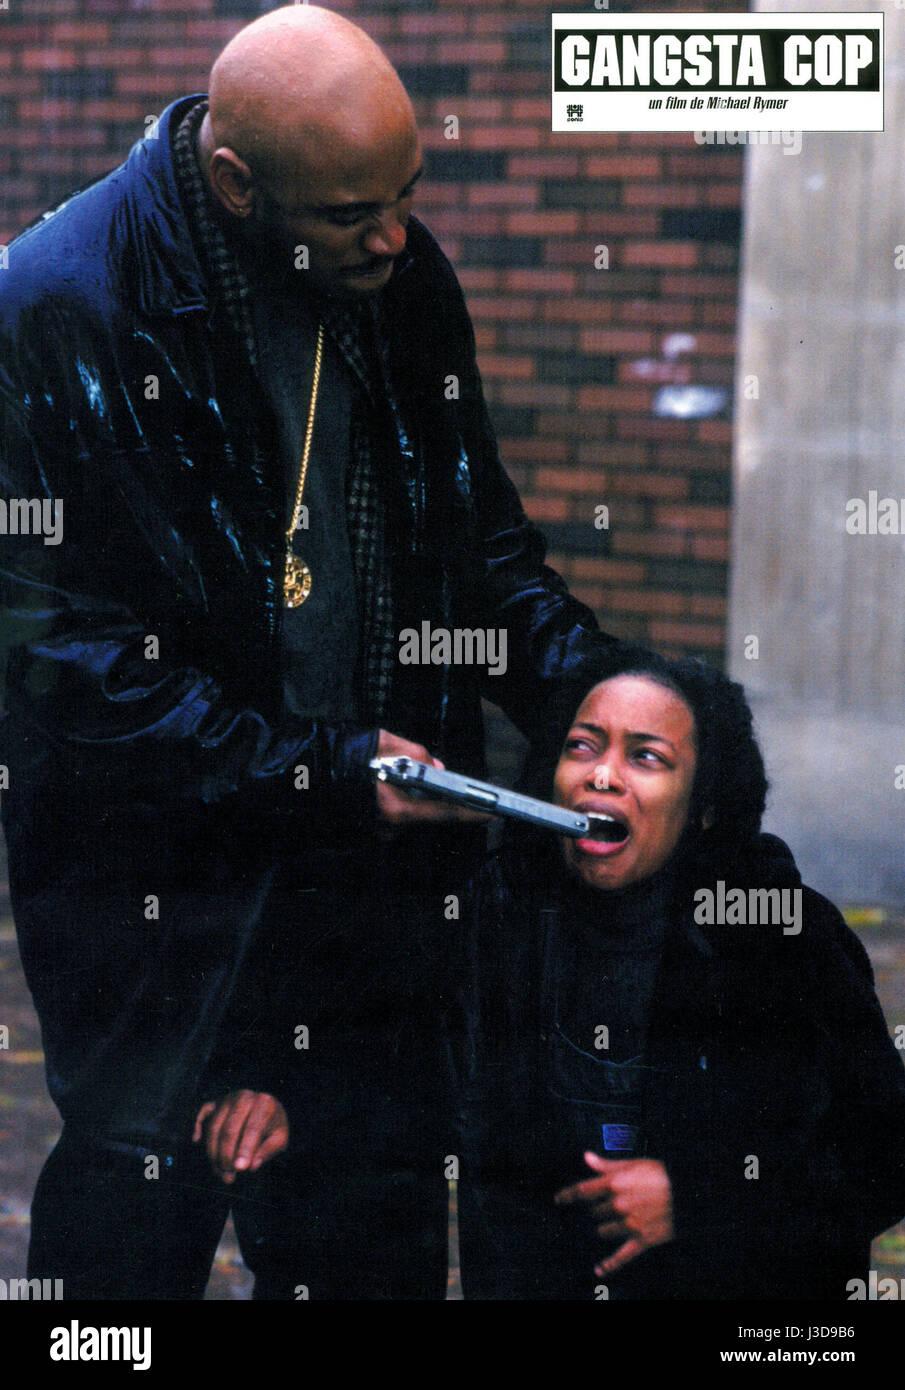 GANGSTA COP IN TOO DEEP  Year: 1999 USA LL Cool J. USA 1999  Director: Michael Rymer - Stock Image